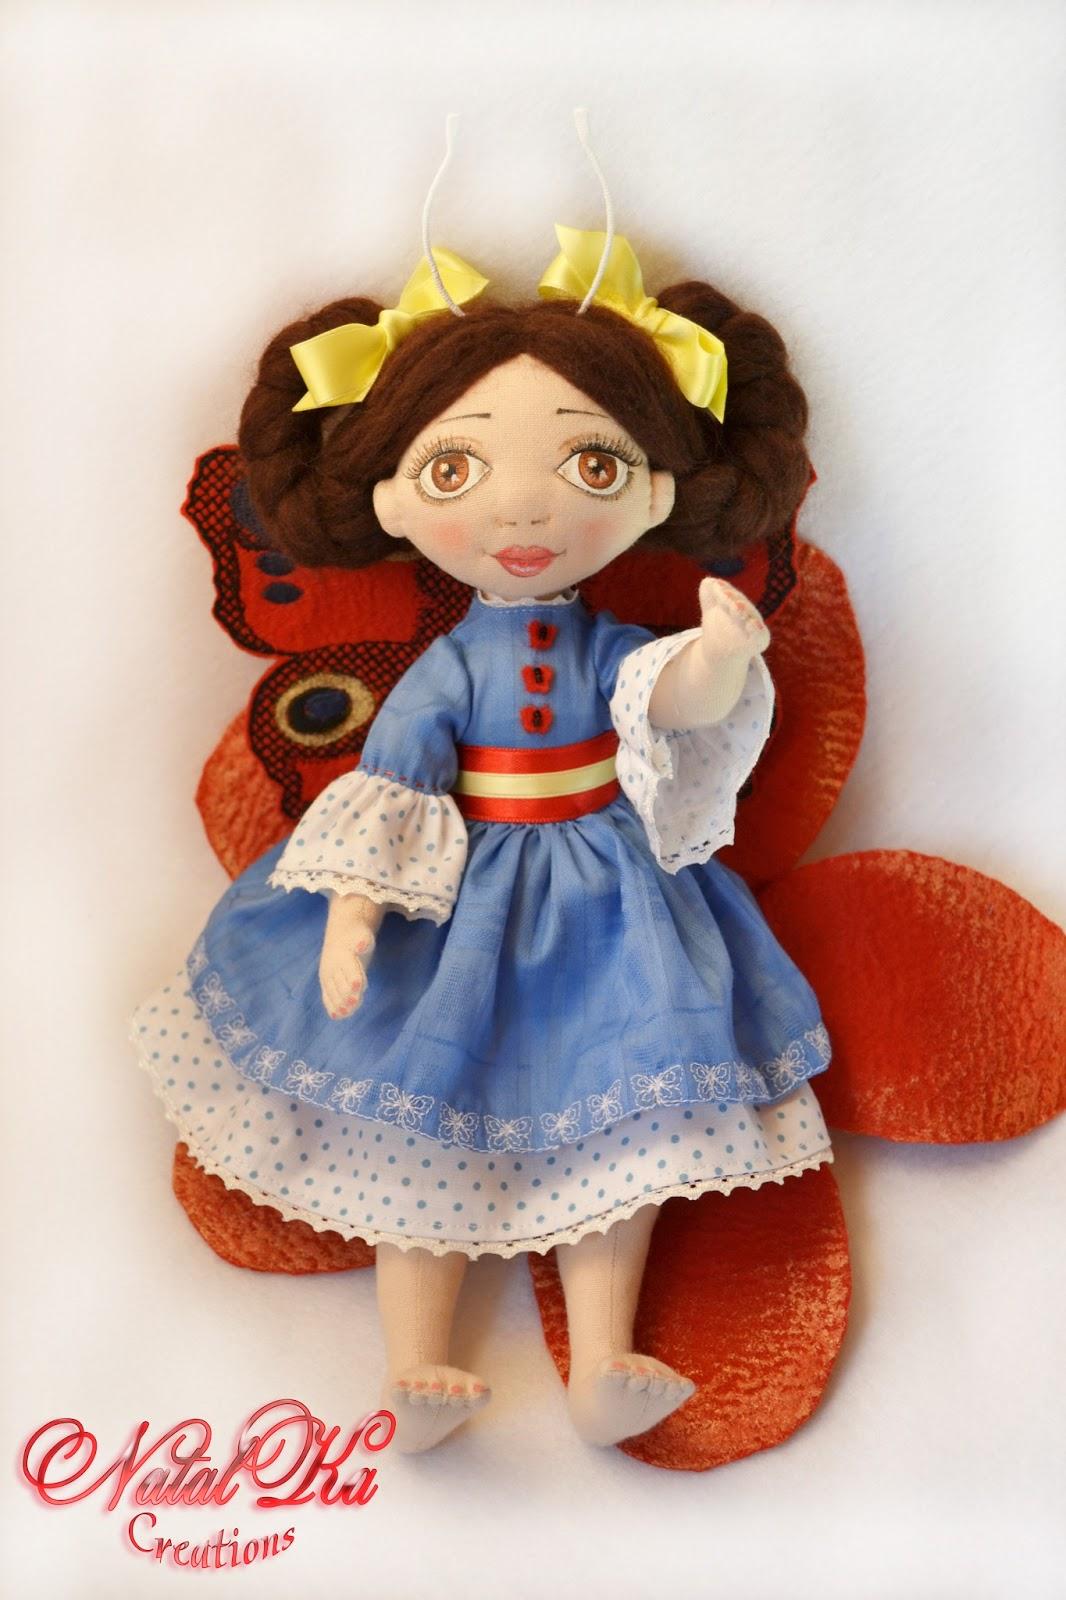 Cloth art doll Katrin. Handgemachte Stoffpuppe Katrin